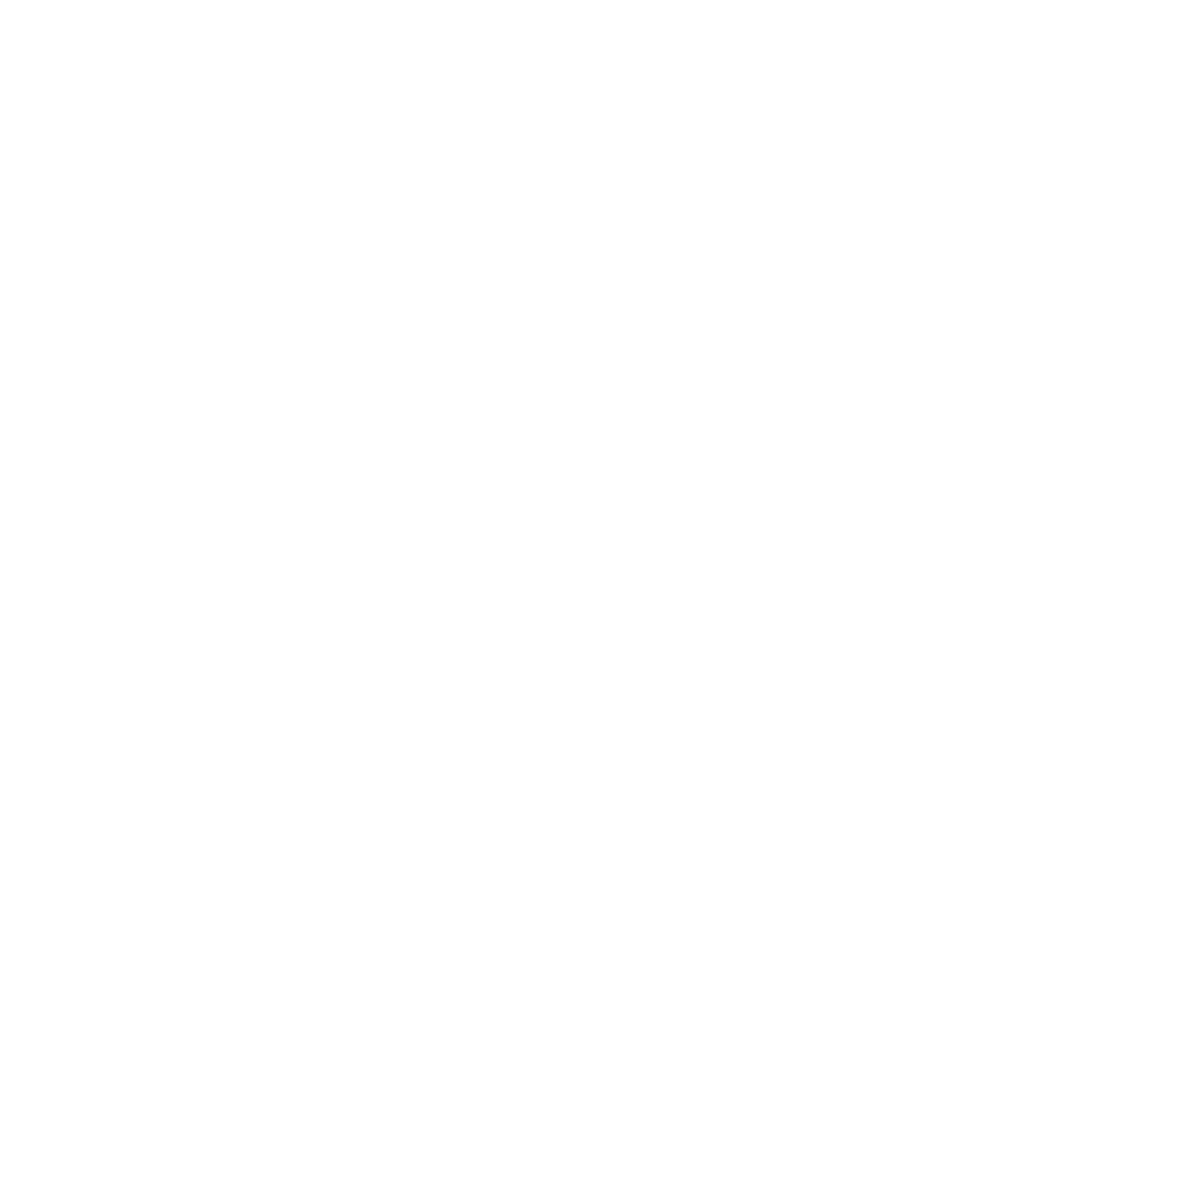 image-credit card.png